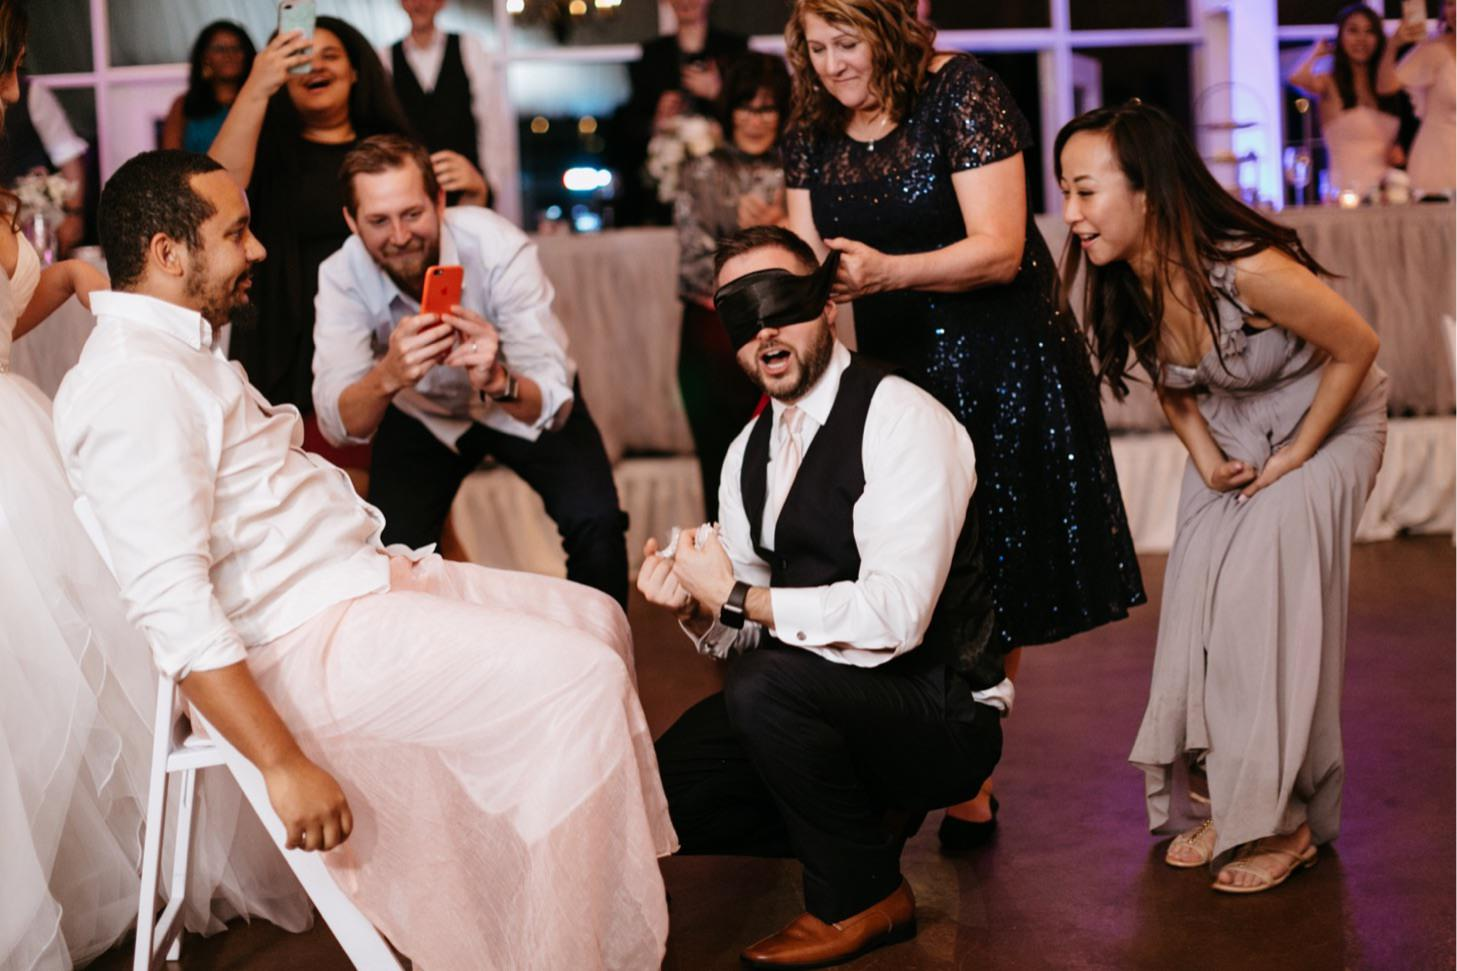 ritz-charles-wedding-reception-downtown-indianapolis-wedding-photographer076.JPG